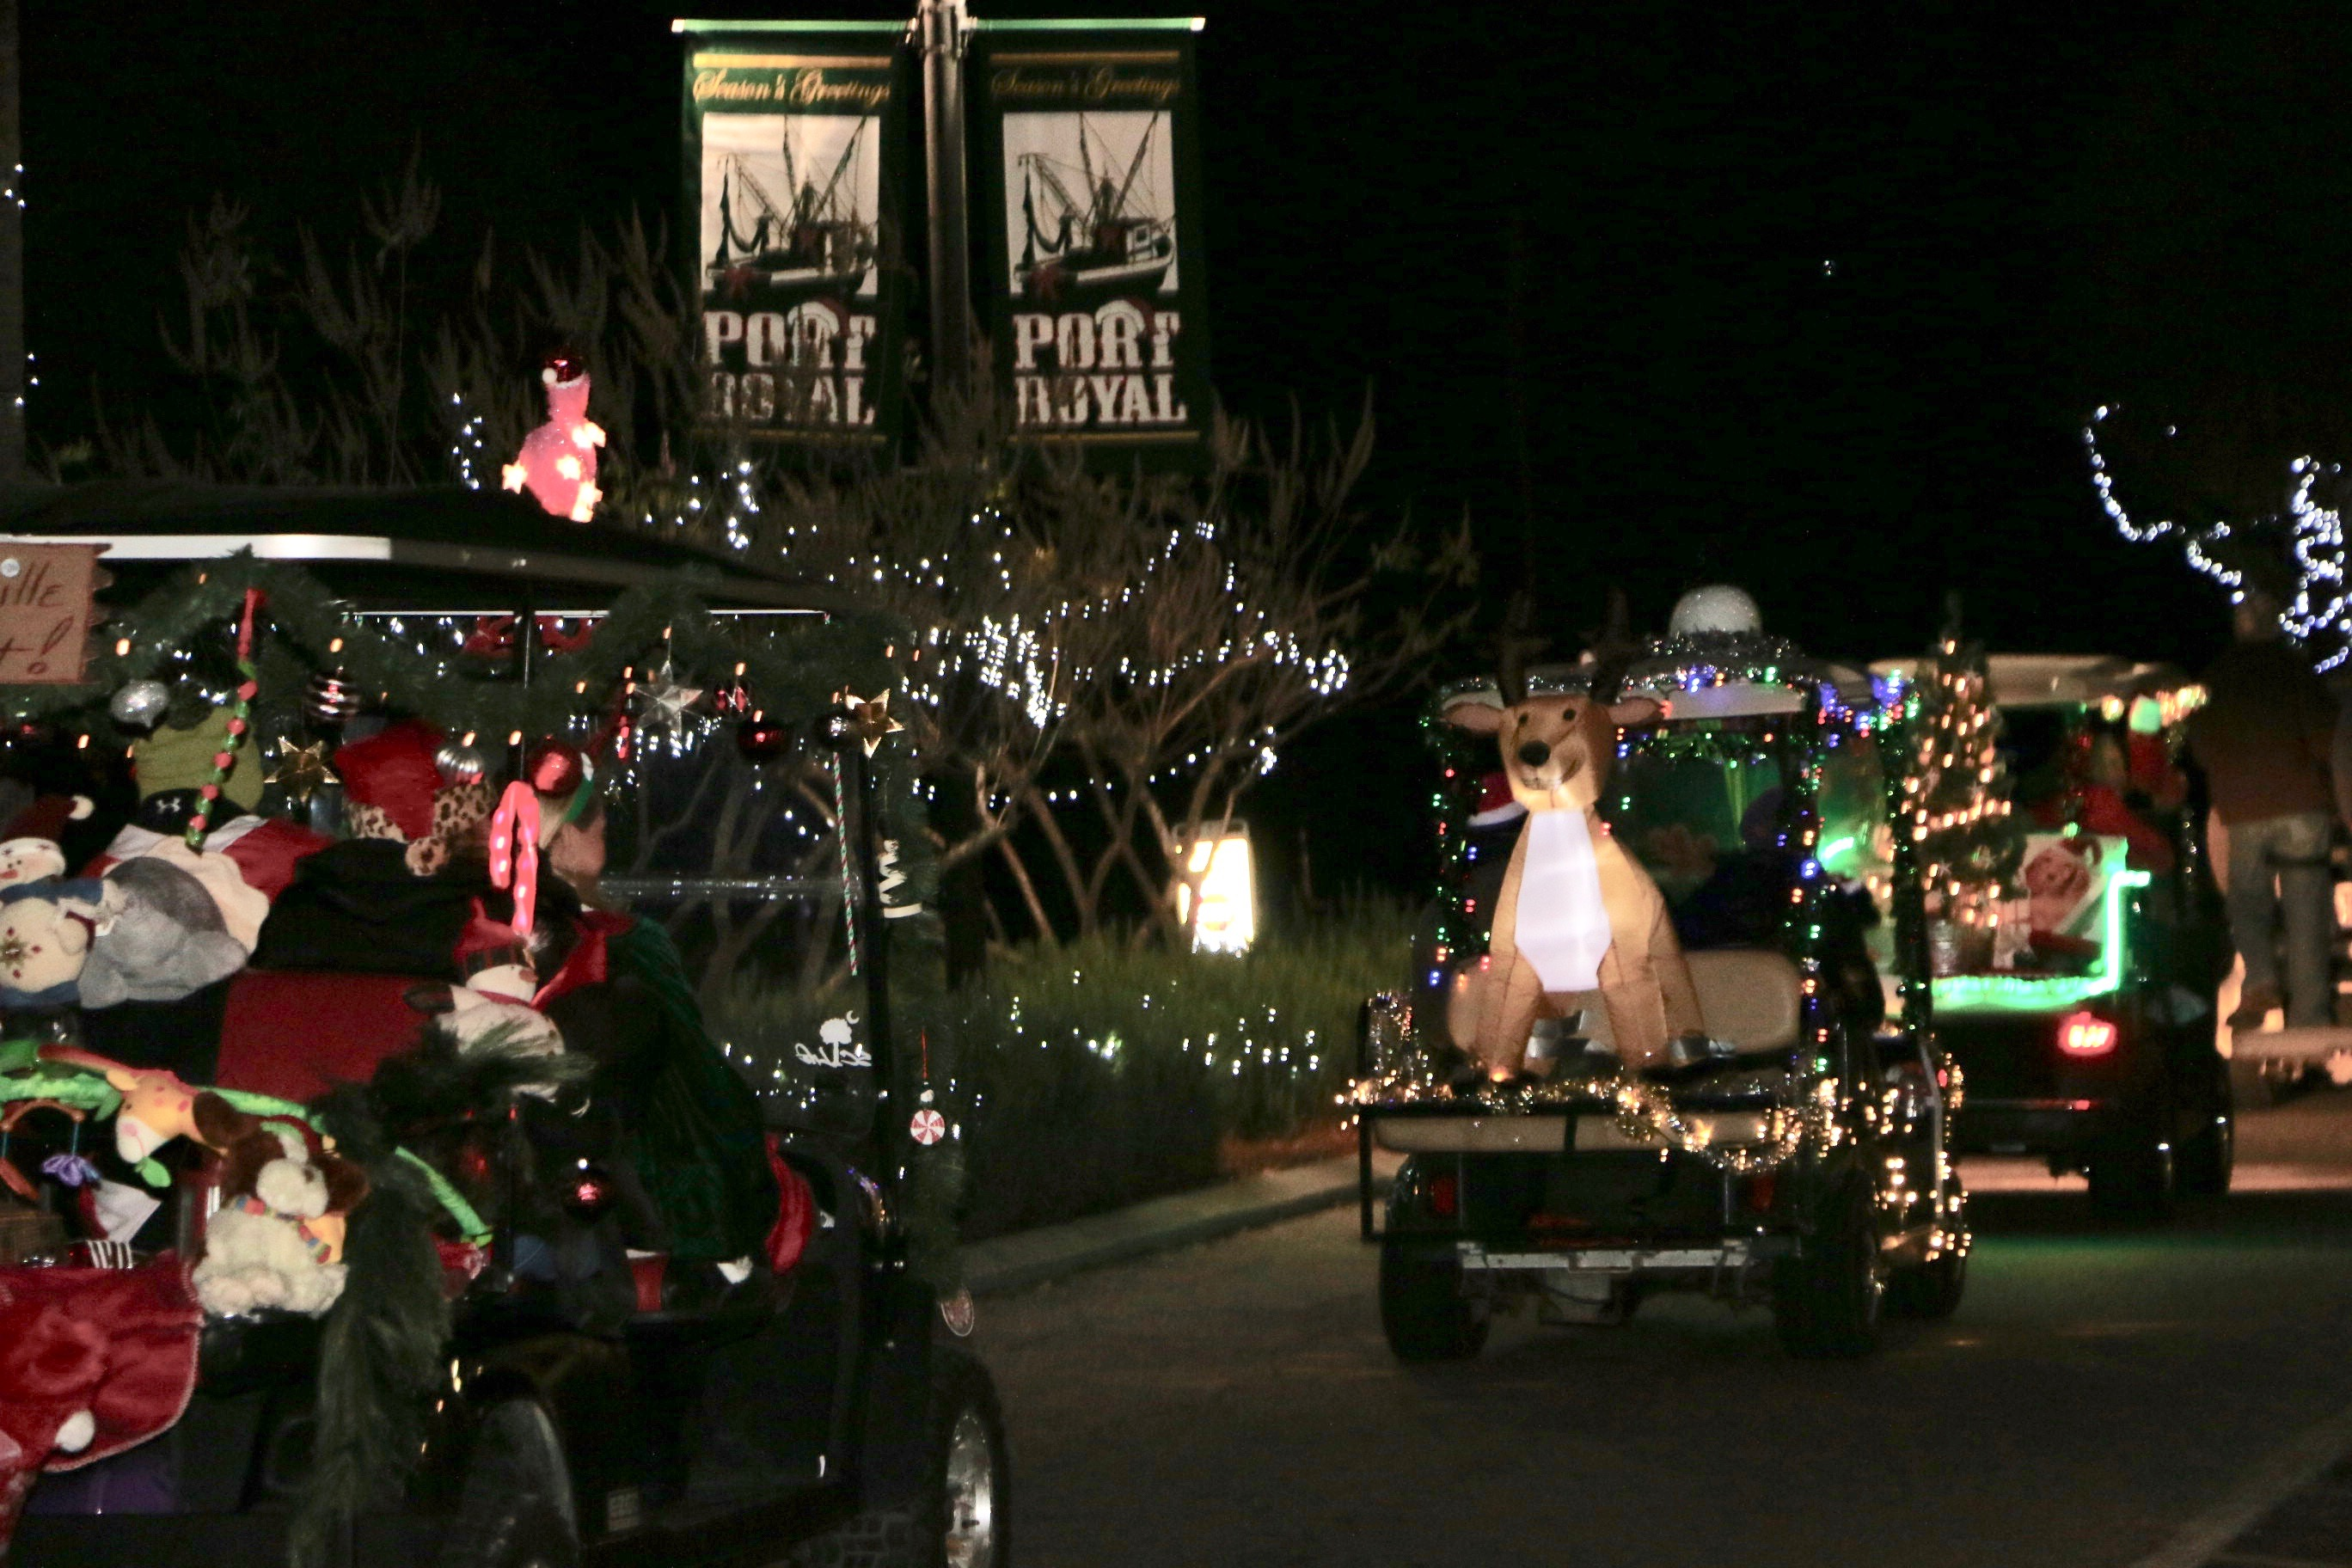 port royal christmas golf cart parade